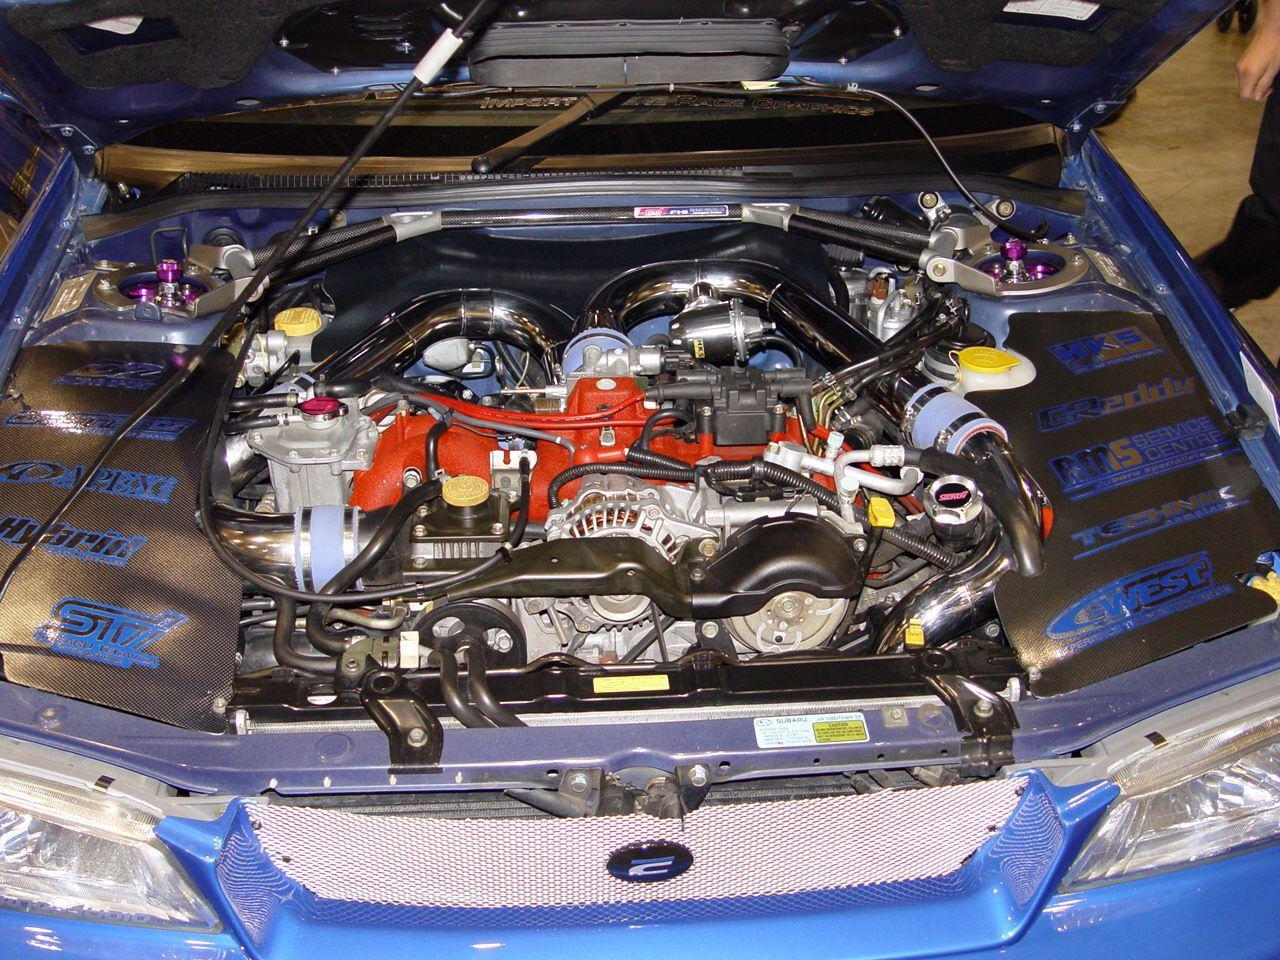 My 1999 subaru impreza wrx sti 2 door version 5